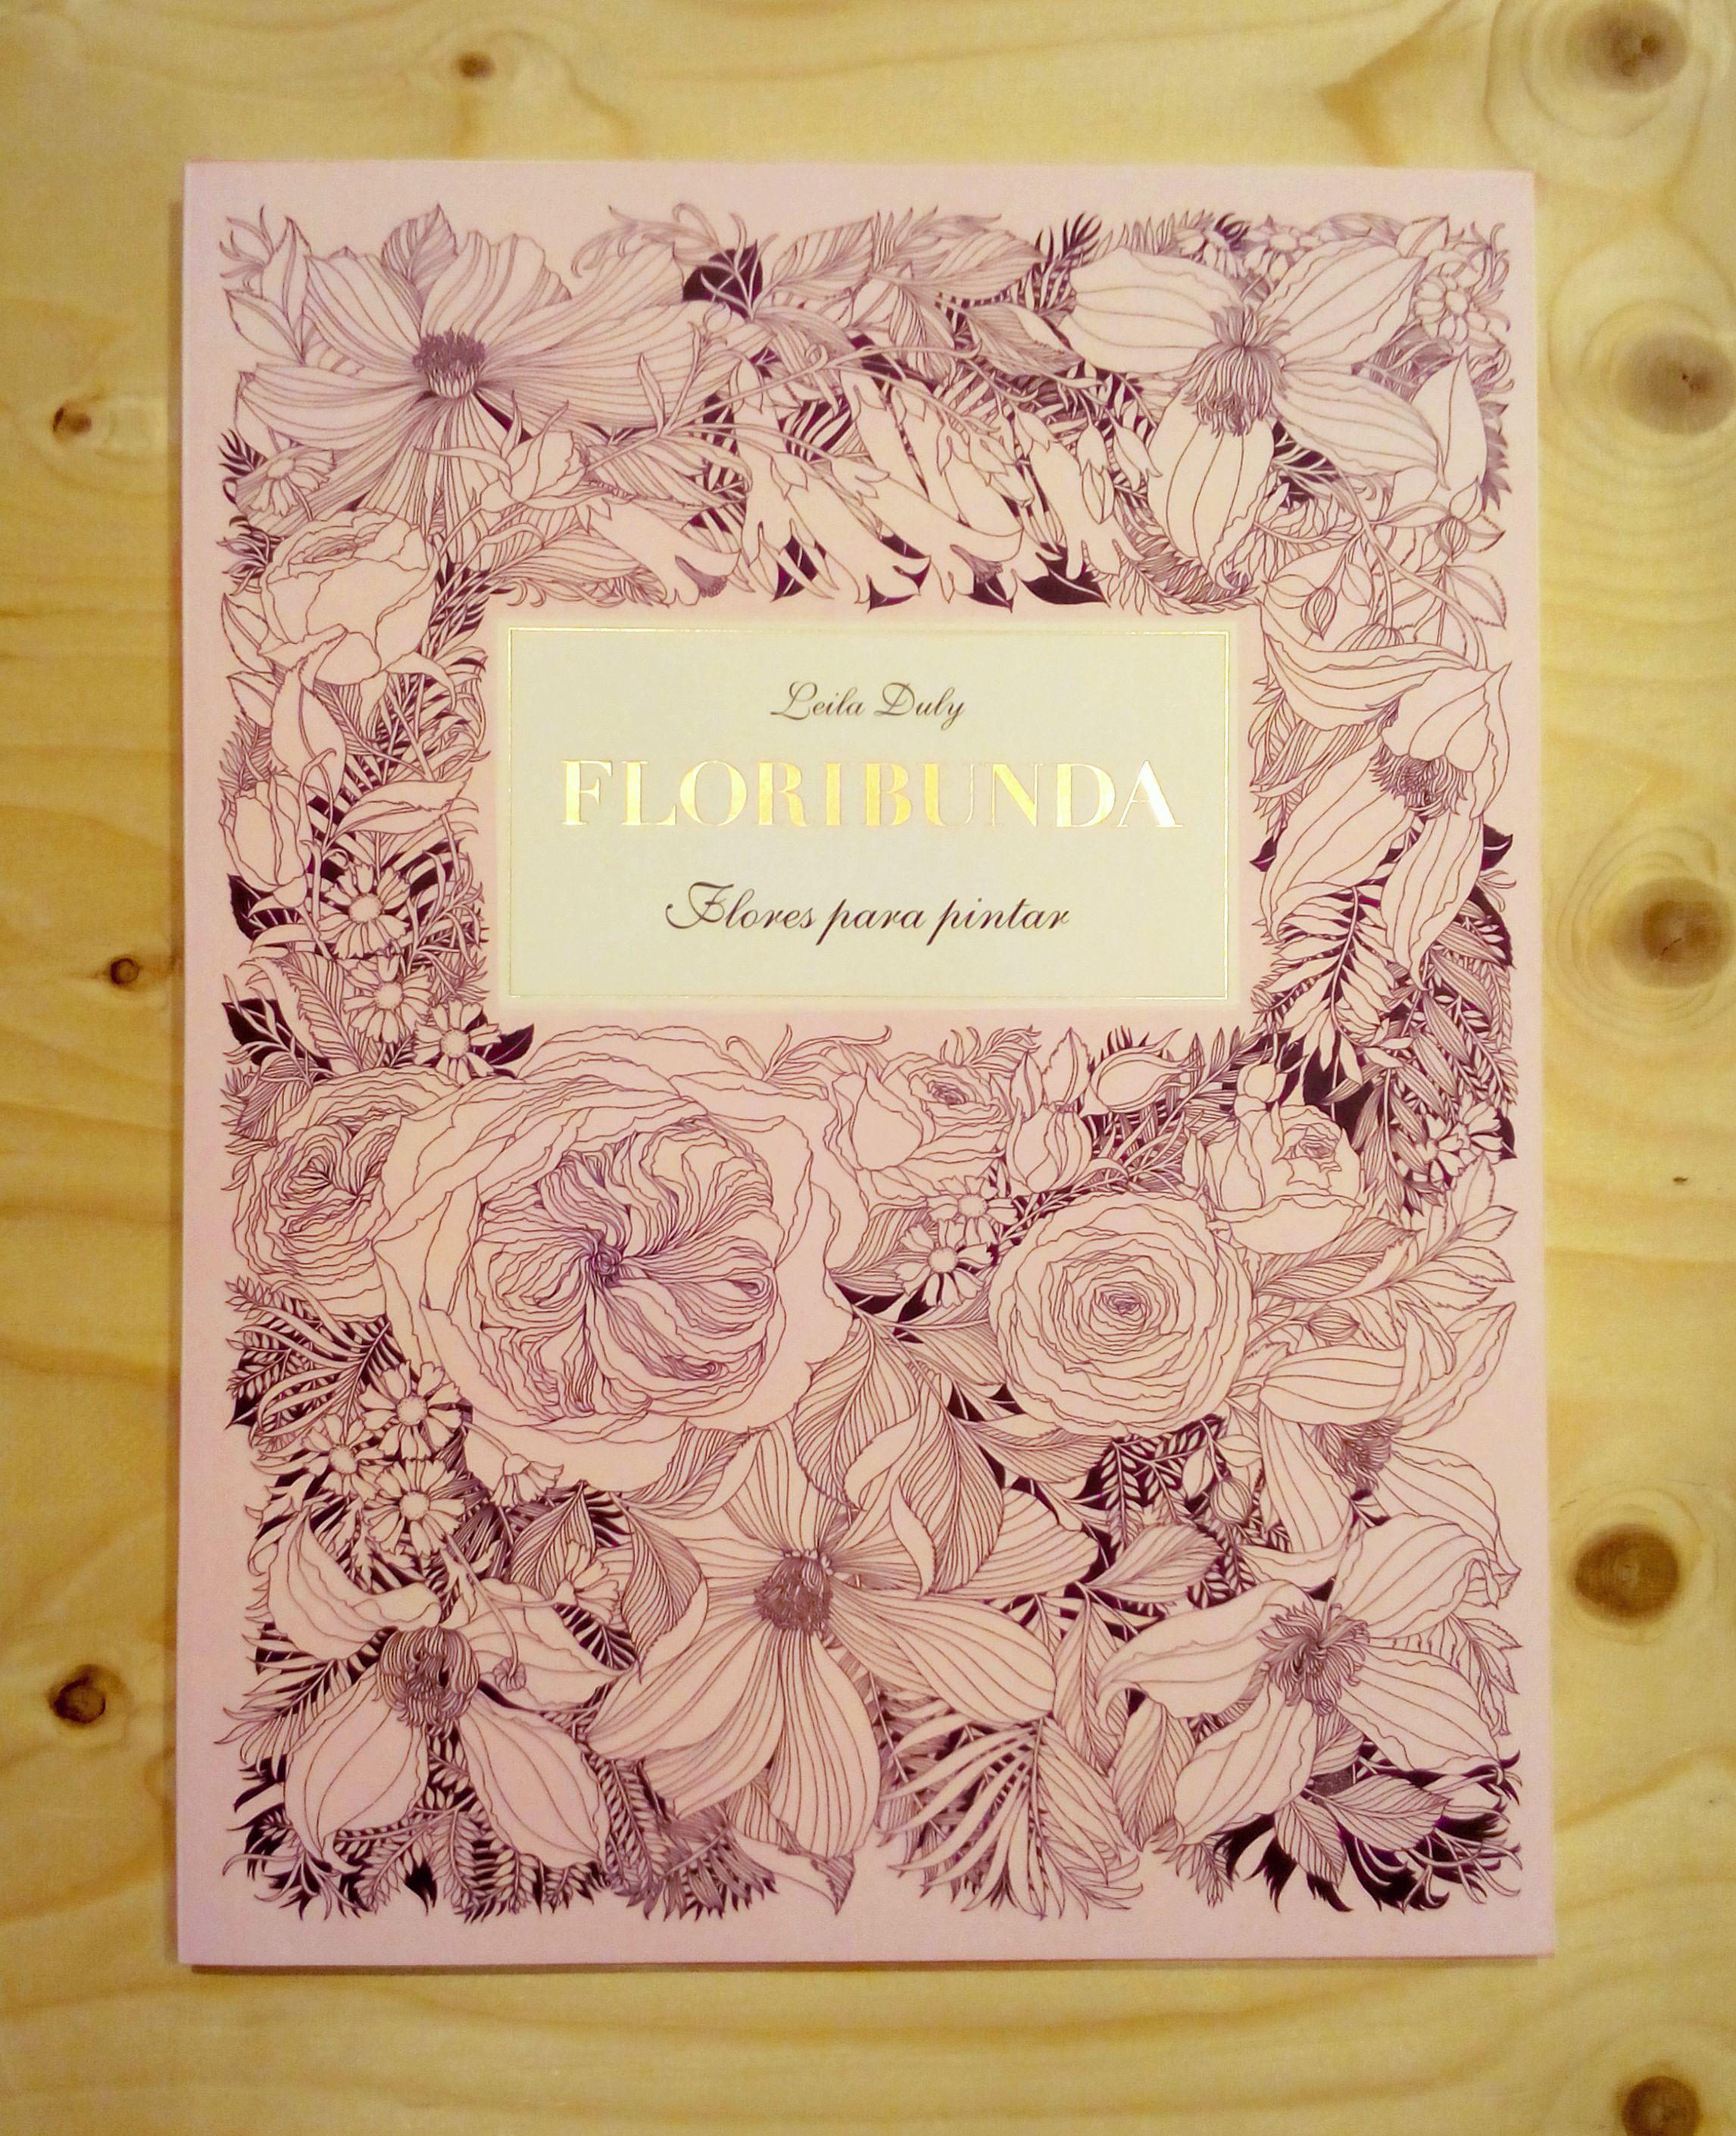 Floribunda, flores para pintar. Leila Duly. MTM editores | Libros ...